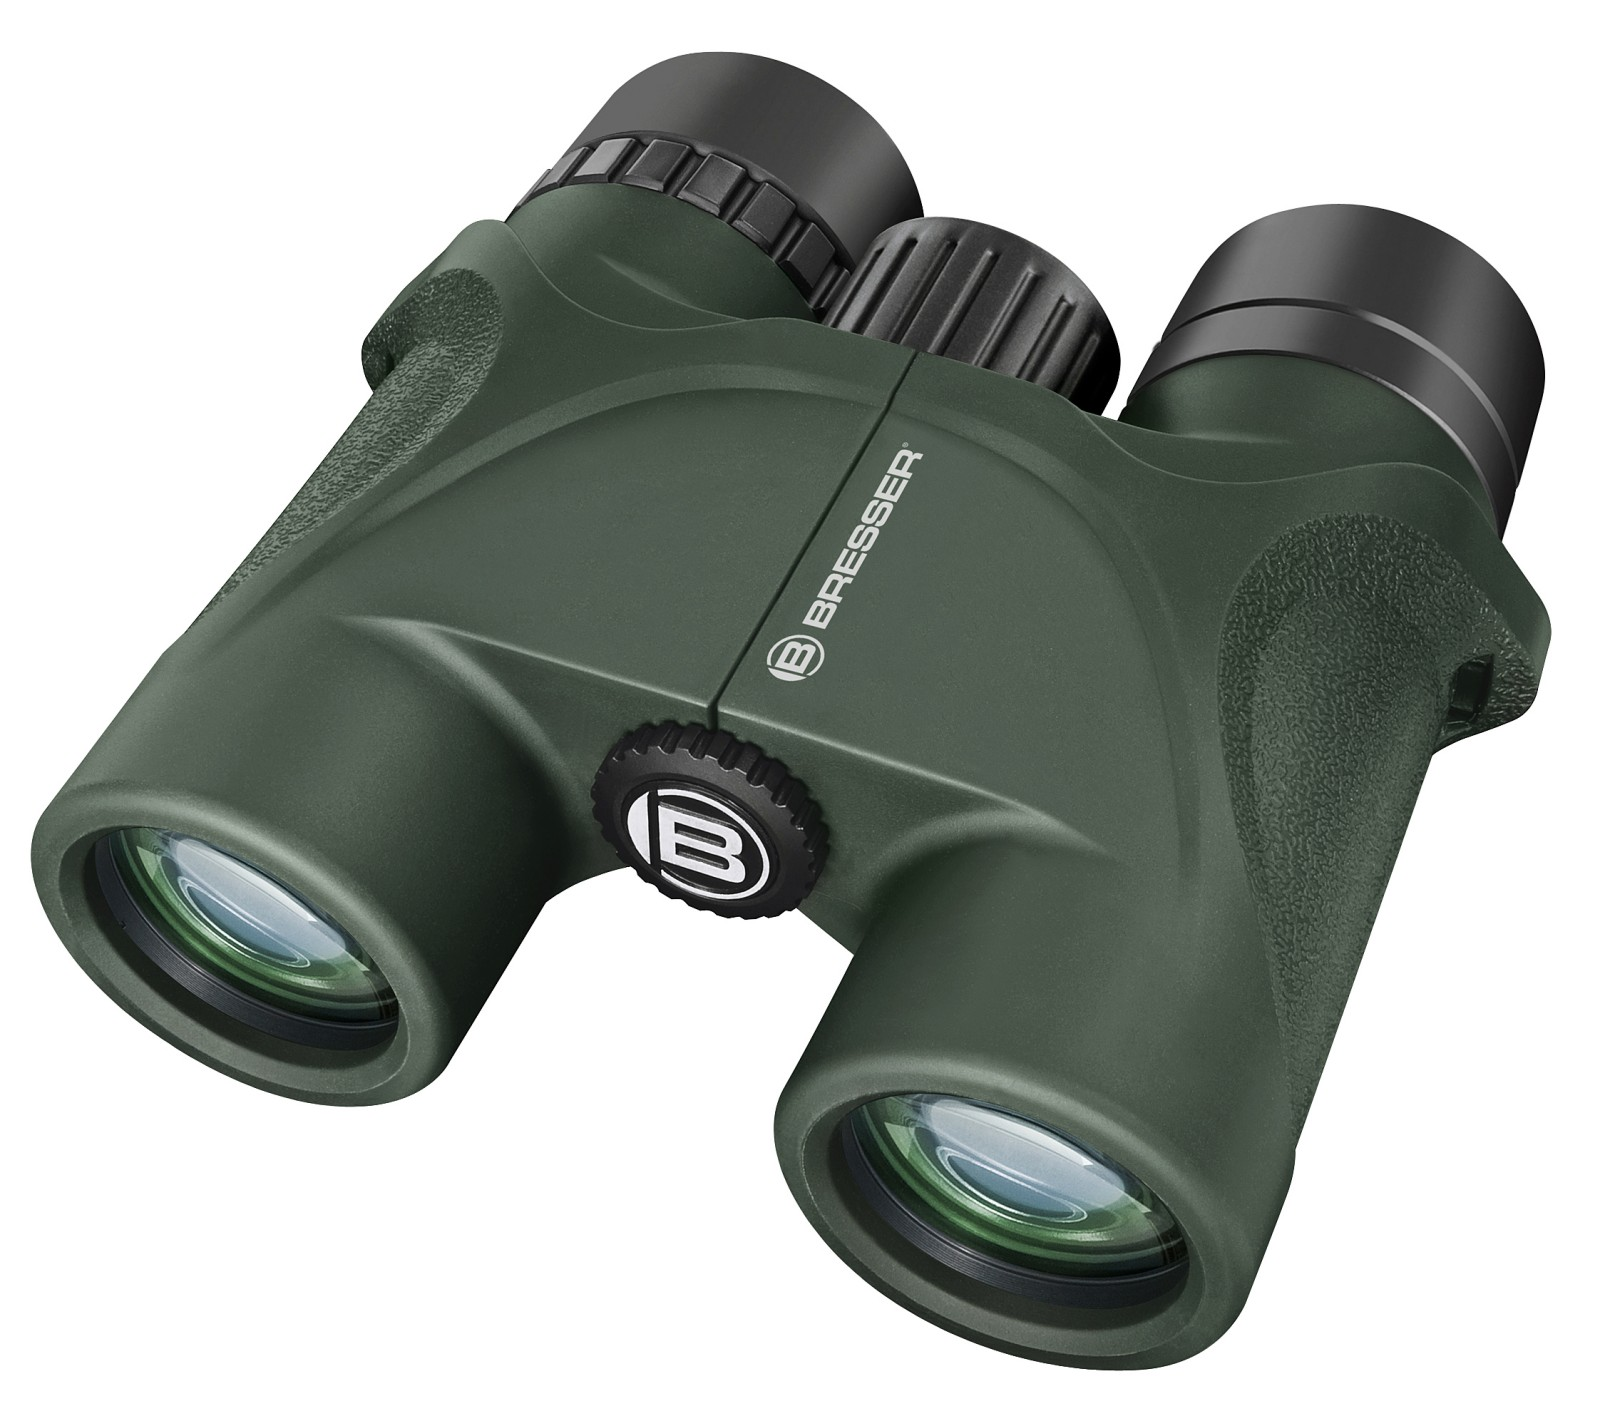 Bresser Condor Binocular, 8x 32mm